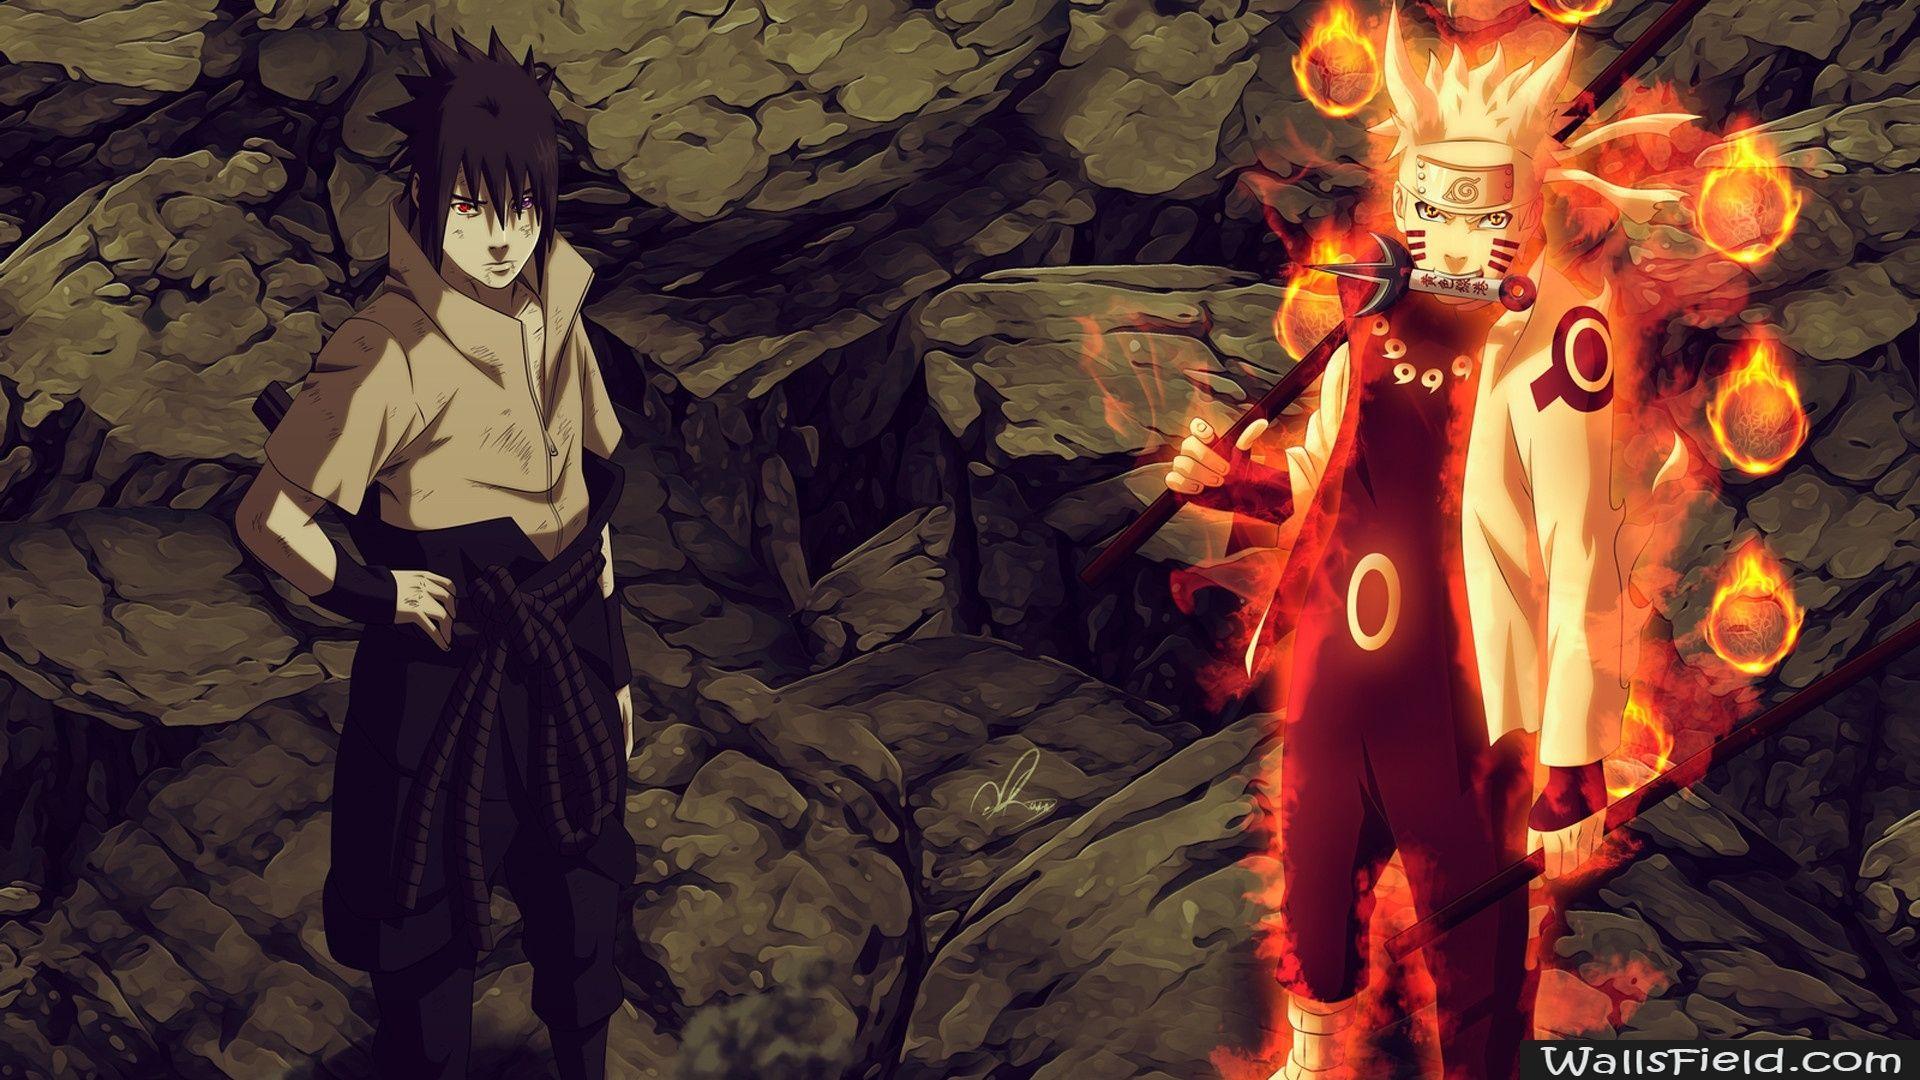 Naruto shippuden wallpaper recherche google sasuke sharingan rinnegan eye naruto sage of six path iitheyahikodarkii voltagebd Gallery